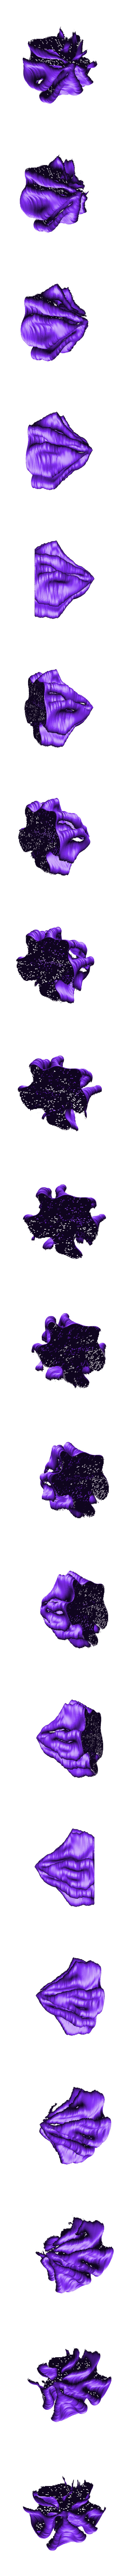 dragonmountain3.stl Download free STL file Weird terrain collection • 3D printer object, ferjerez3d